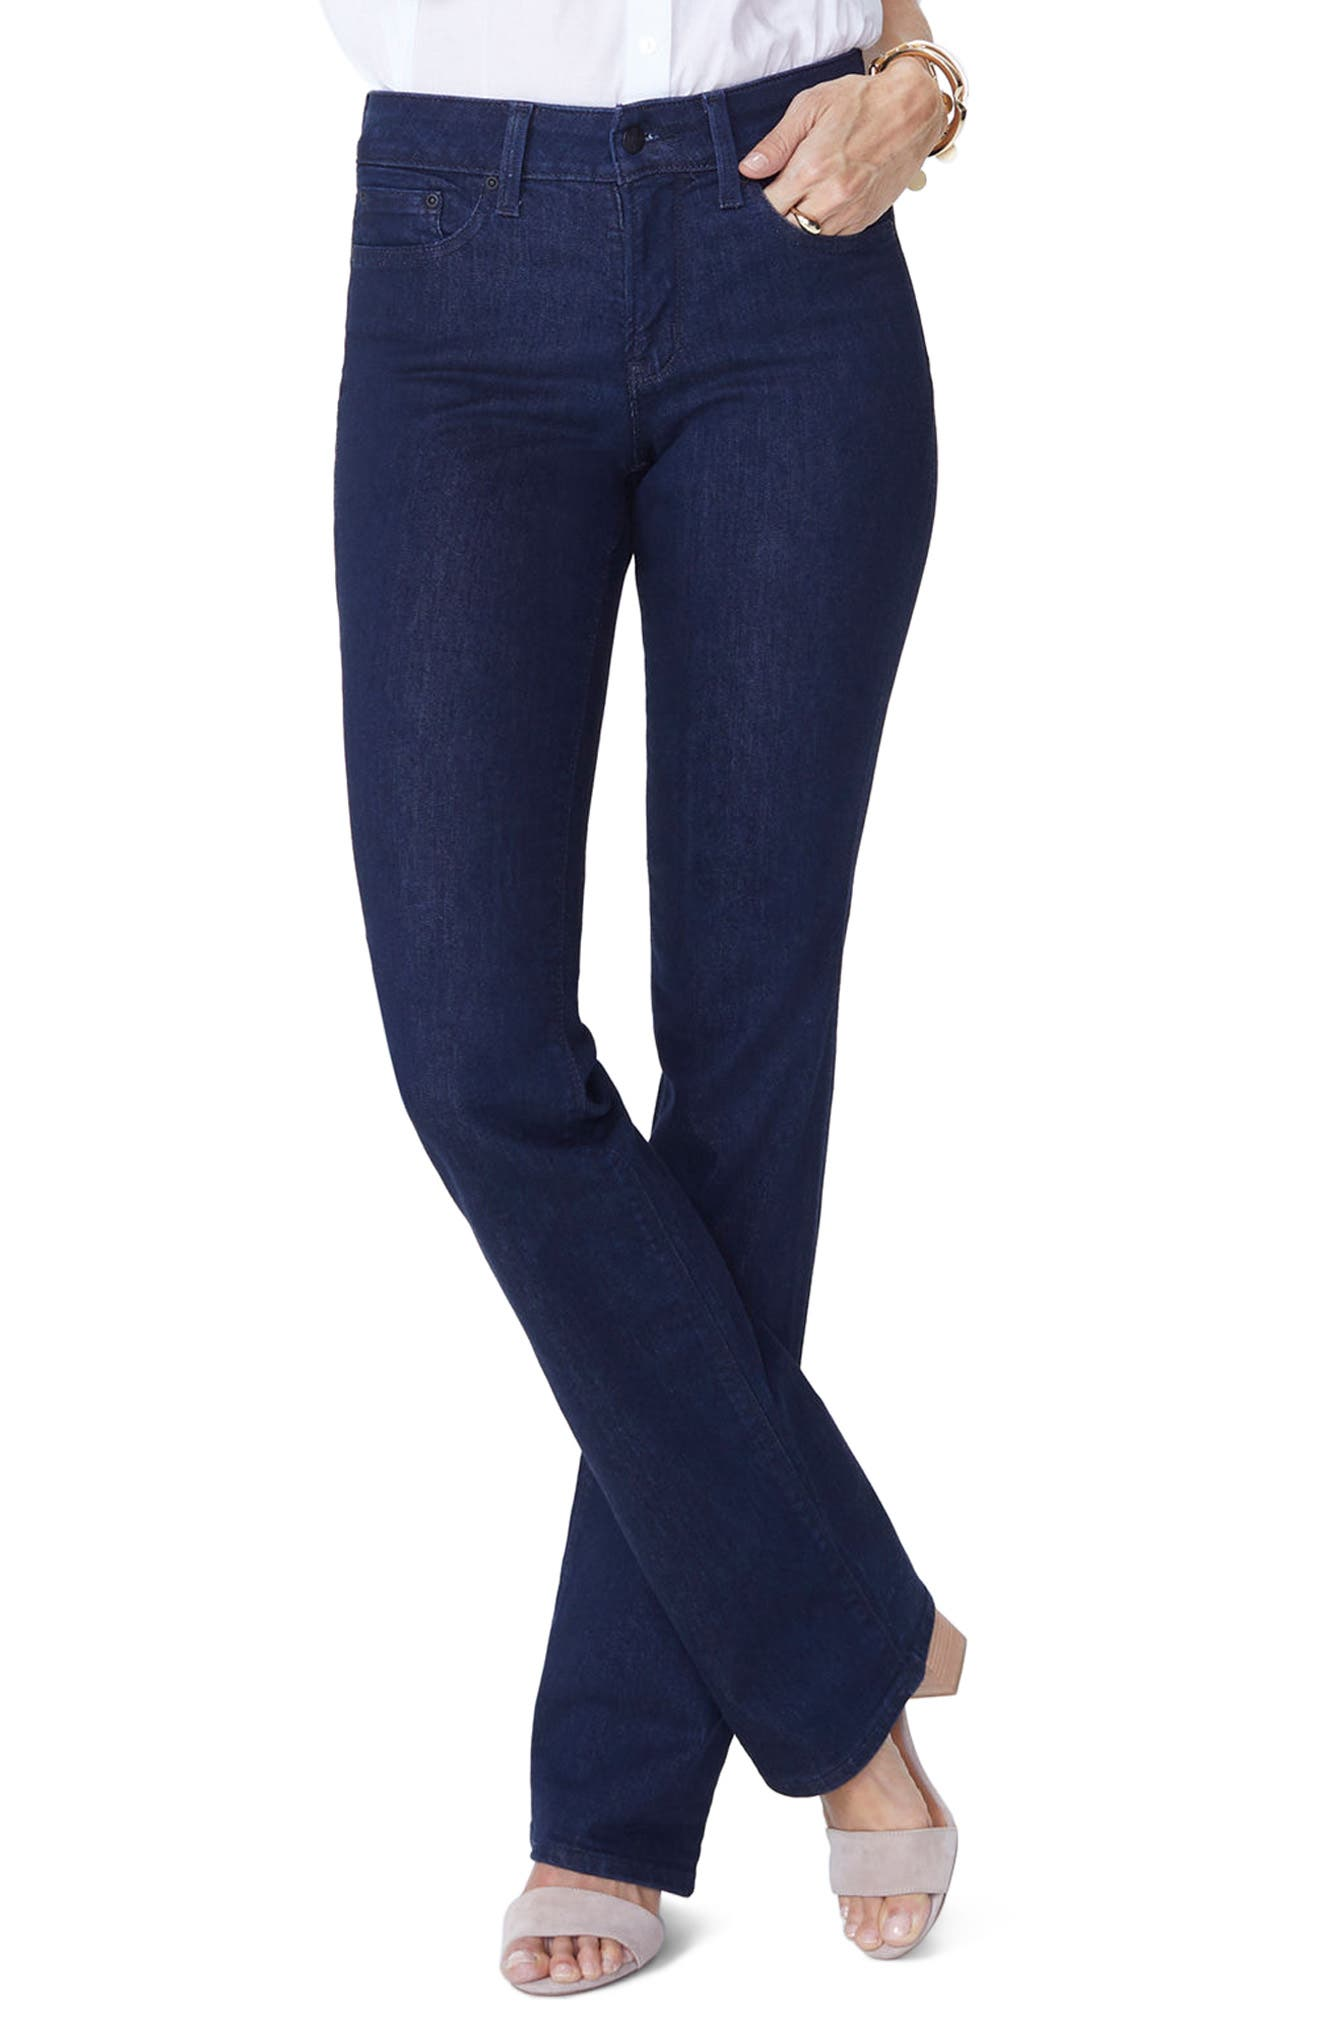 Barbara High Waist Stretch Bootcut Jeans,                             Main thumbnail 1, color,                             RINSE